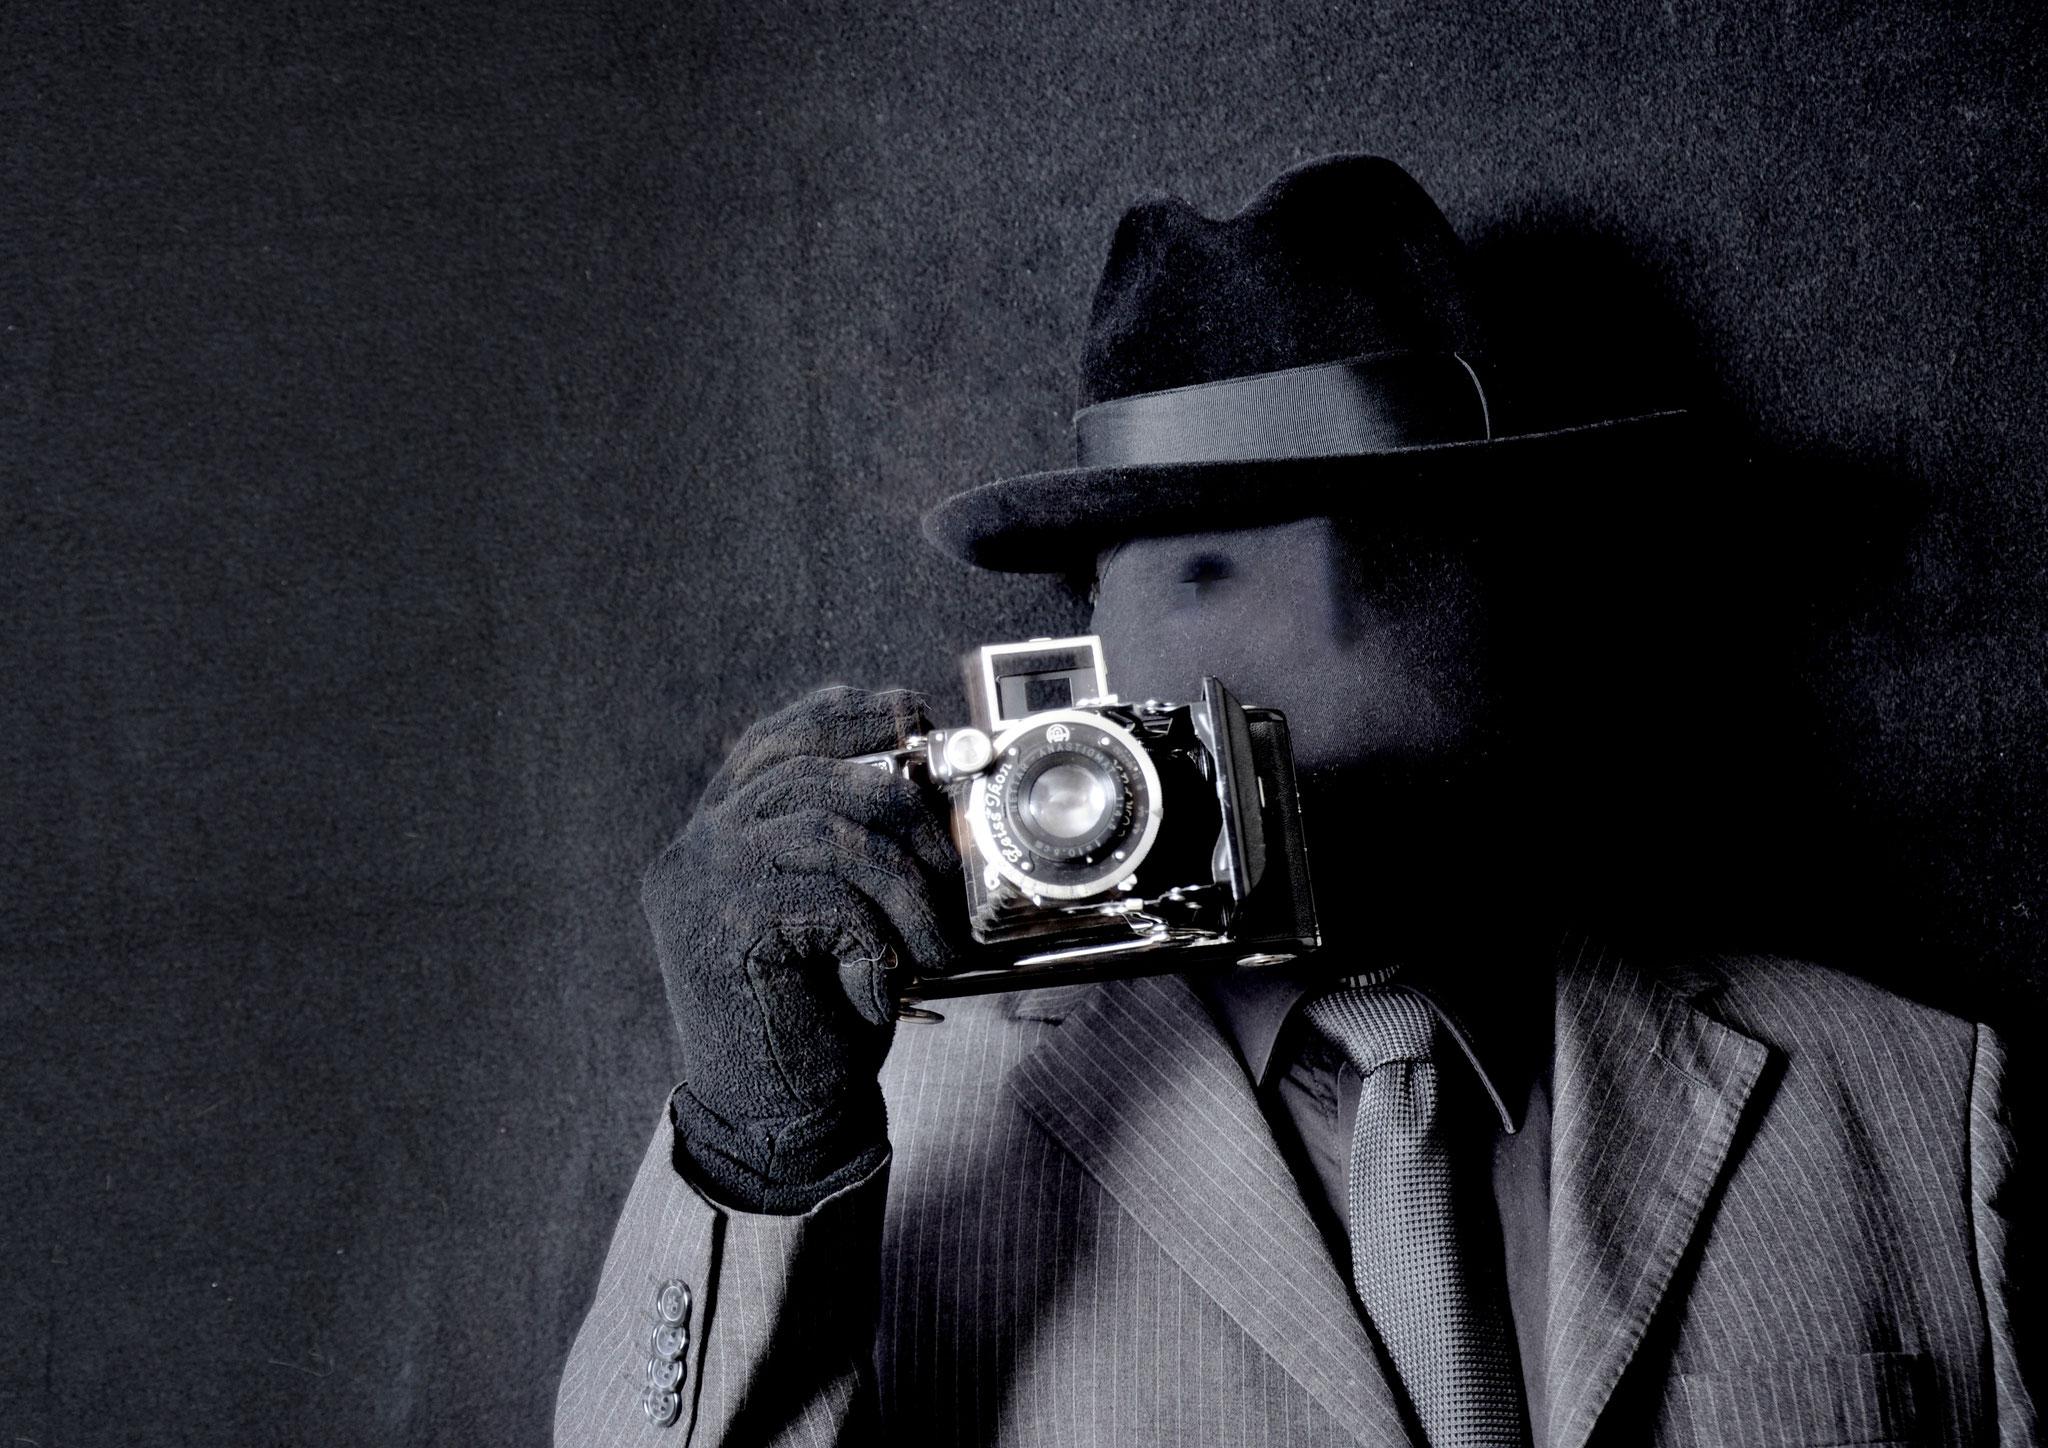 Selbstbildnis als Foptograf